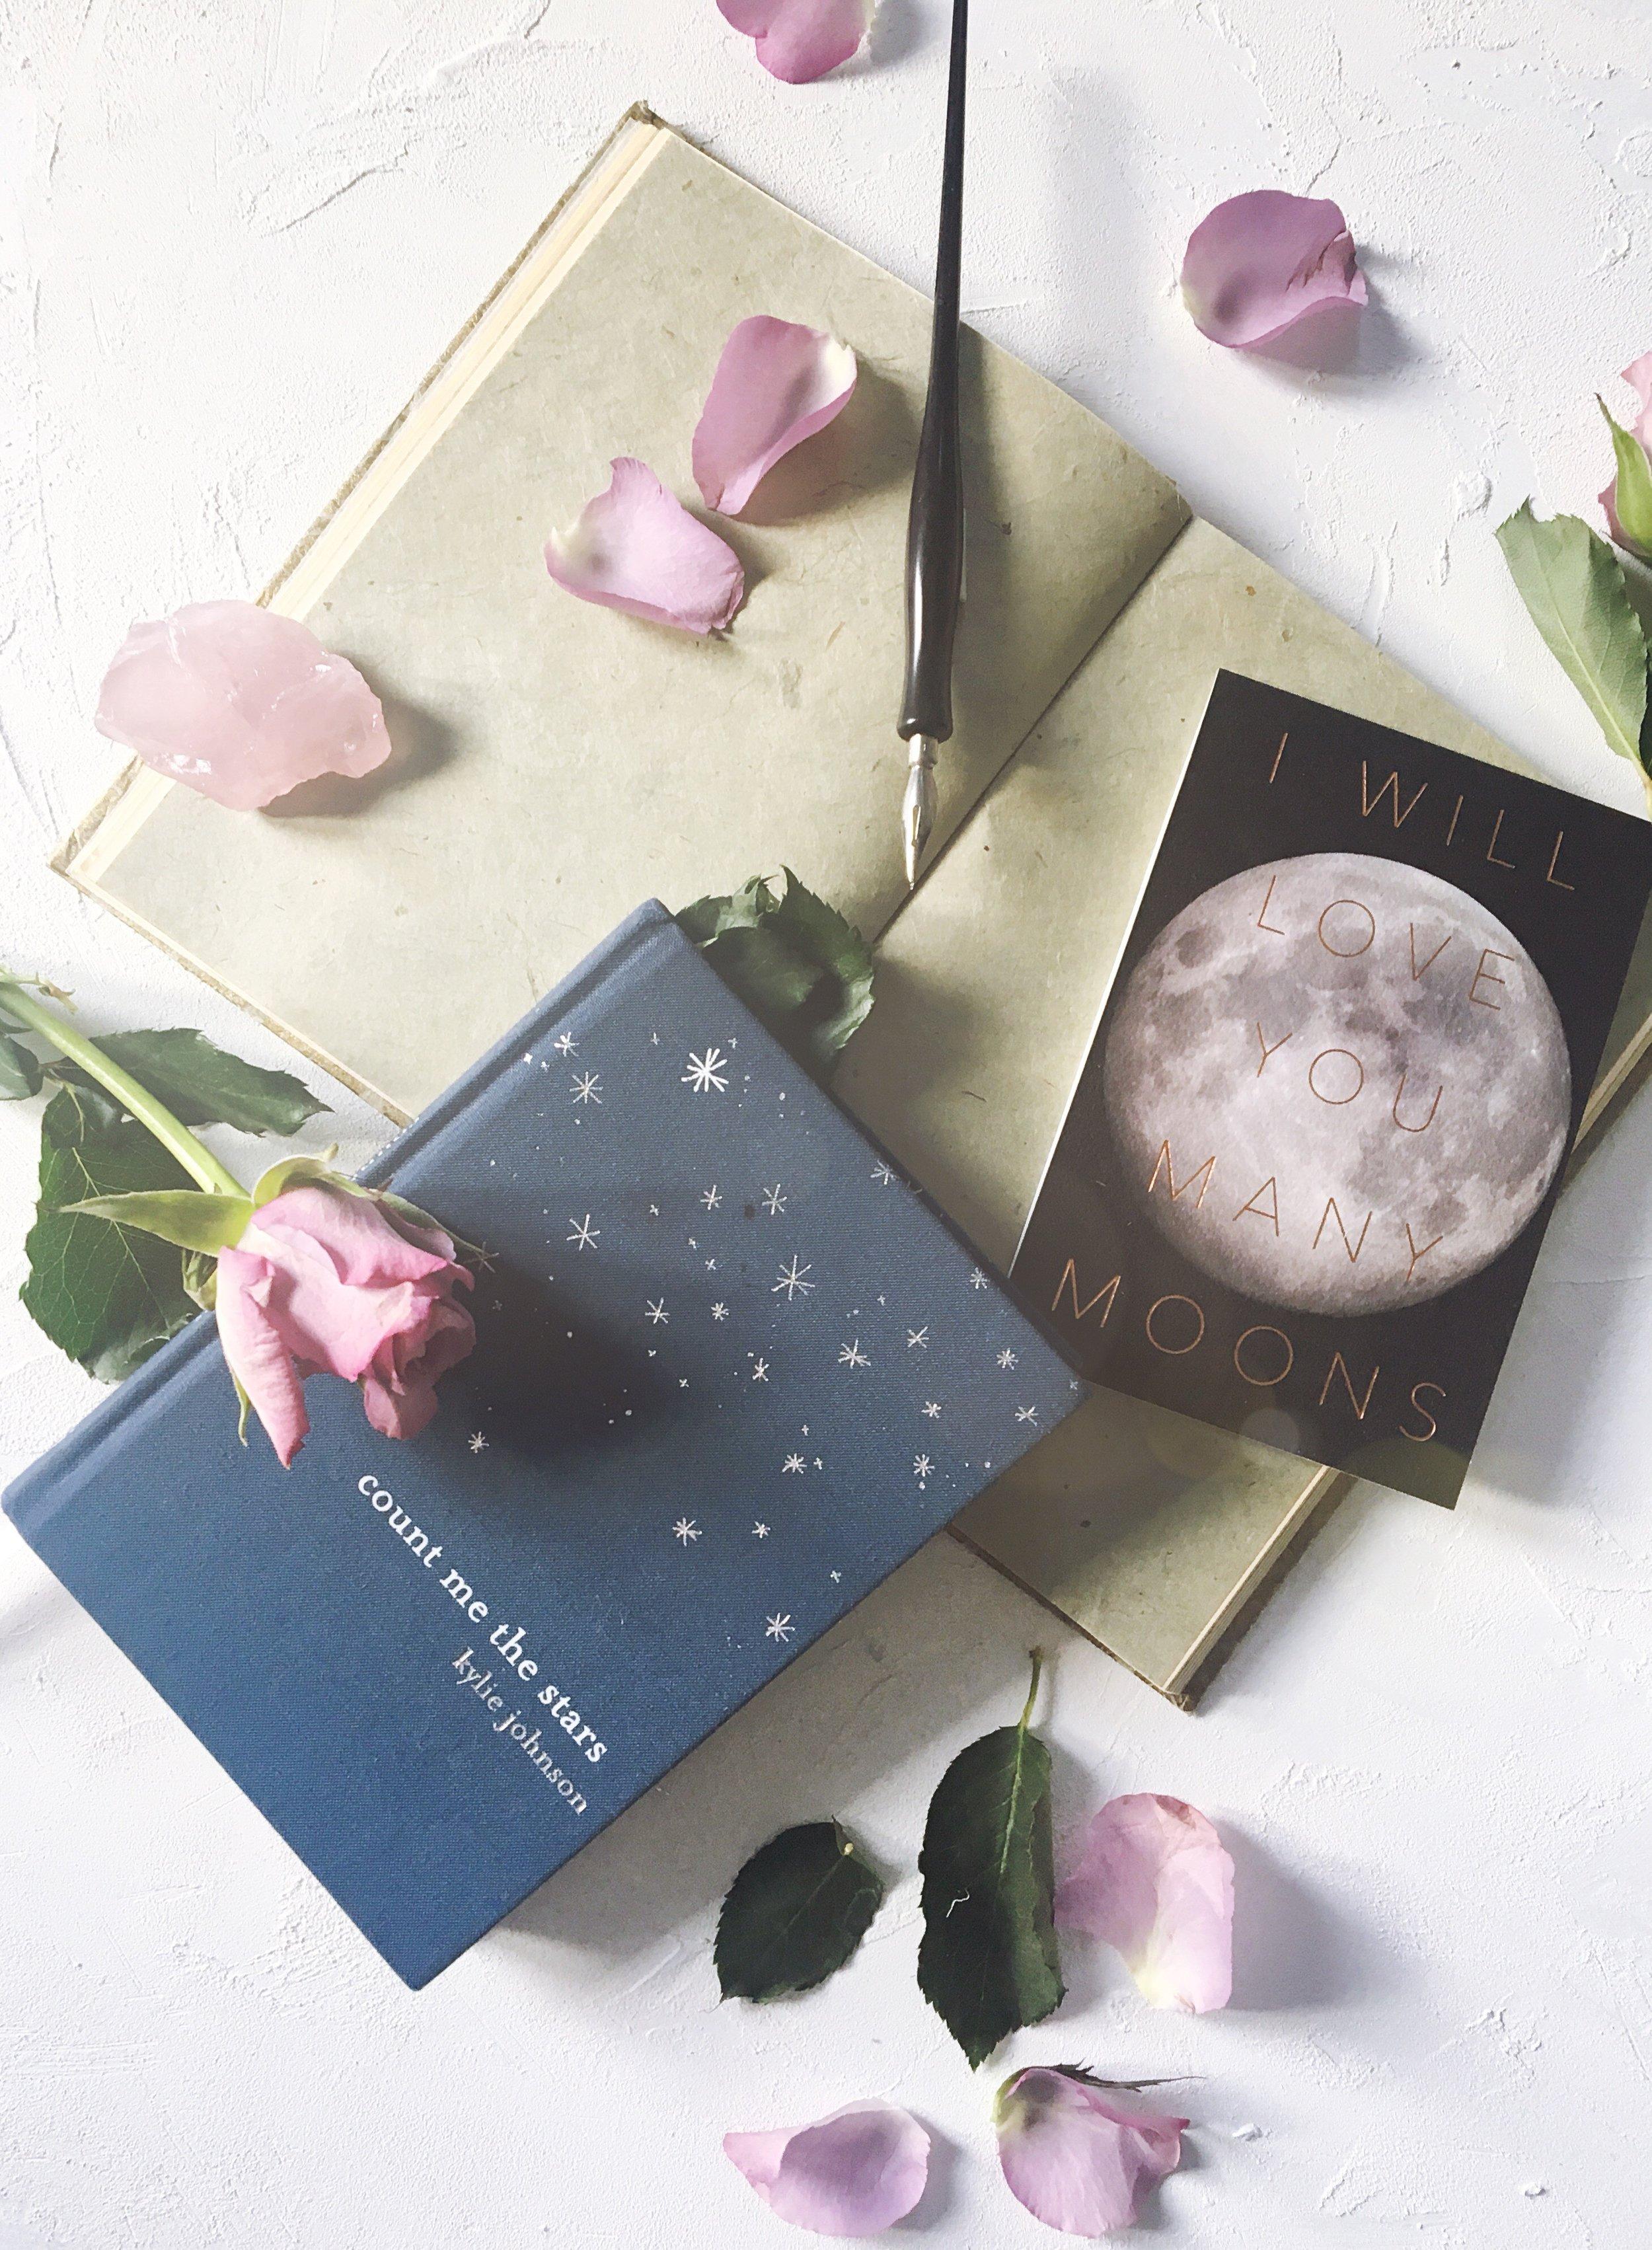 enchanted-by-sunlight-cacao-elixir-romantic-flatlay.JPG